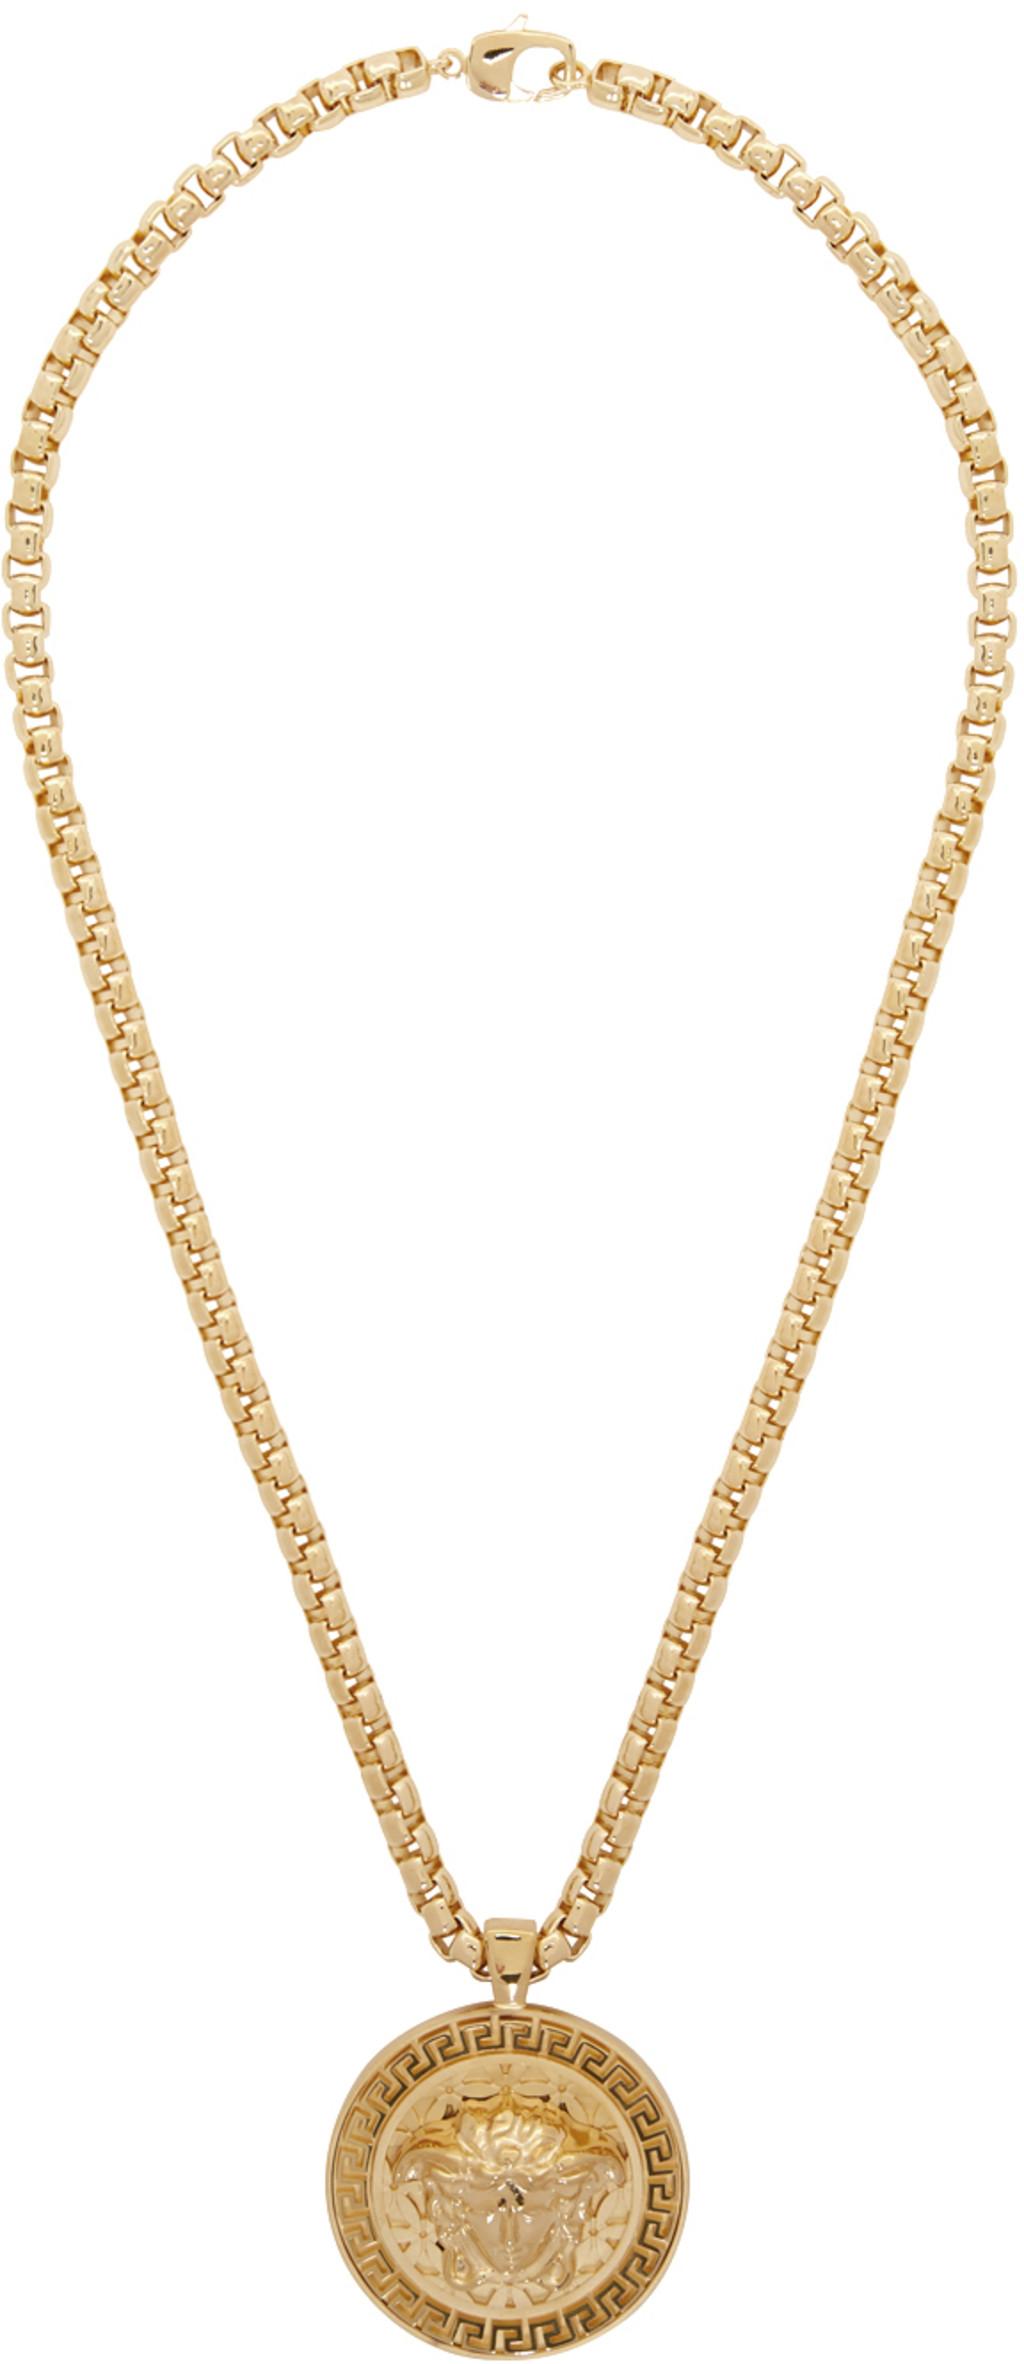 bc125c7778df3 Gold Medusa Necklace